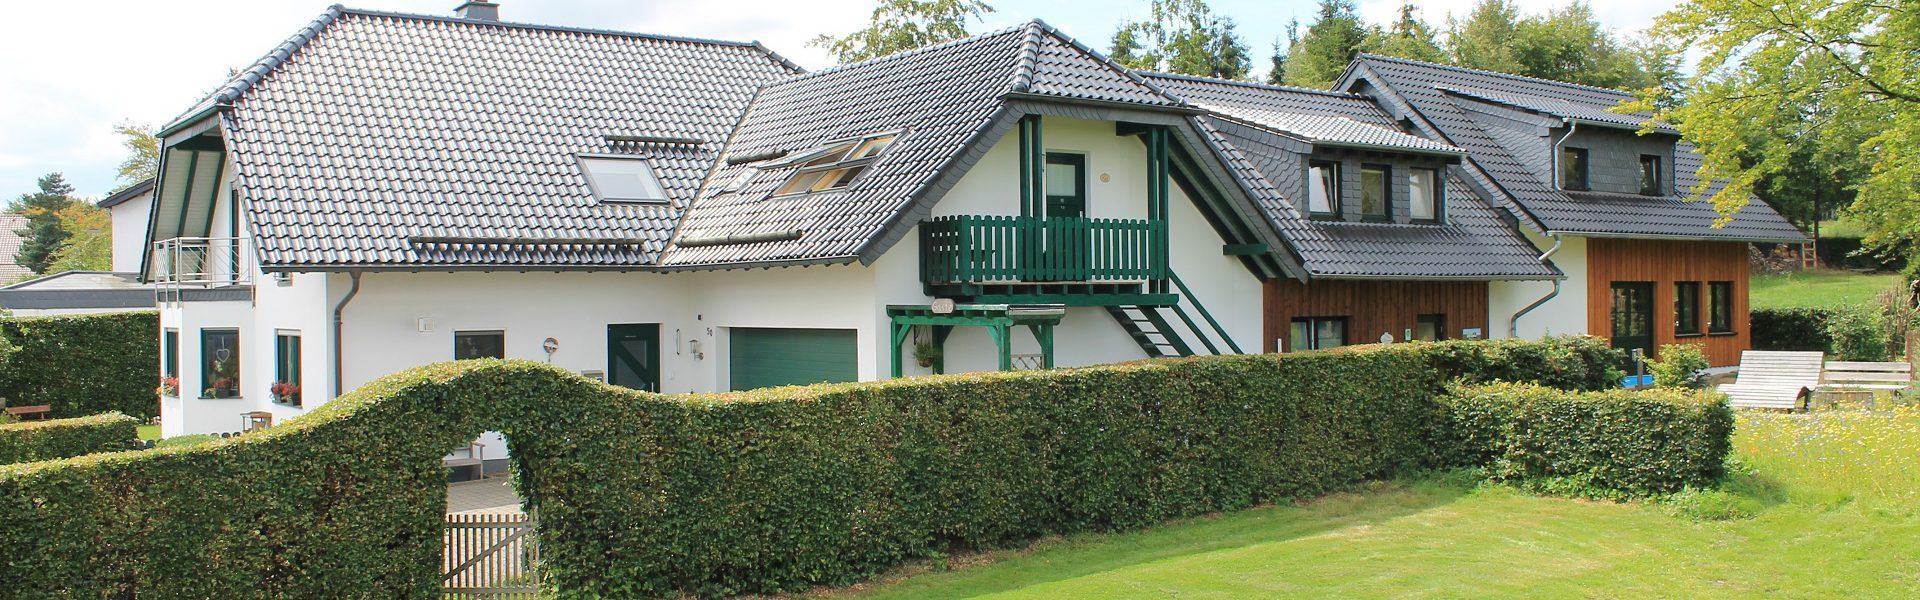 Gästehaus Kuck